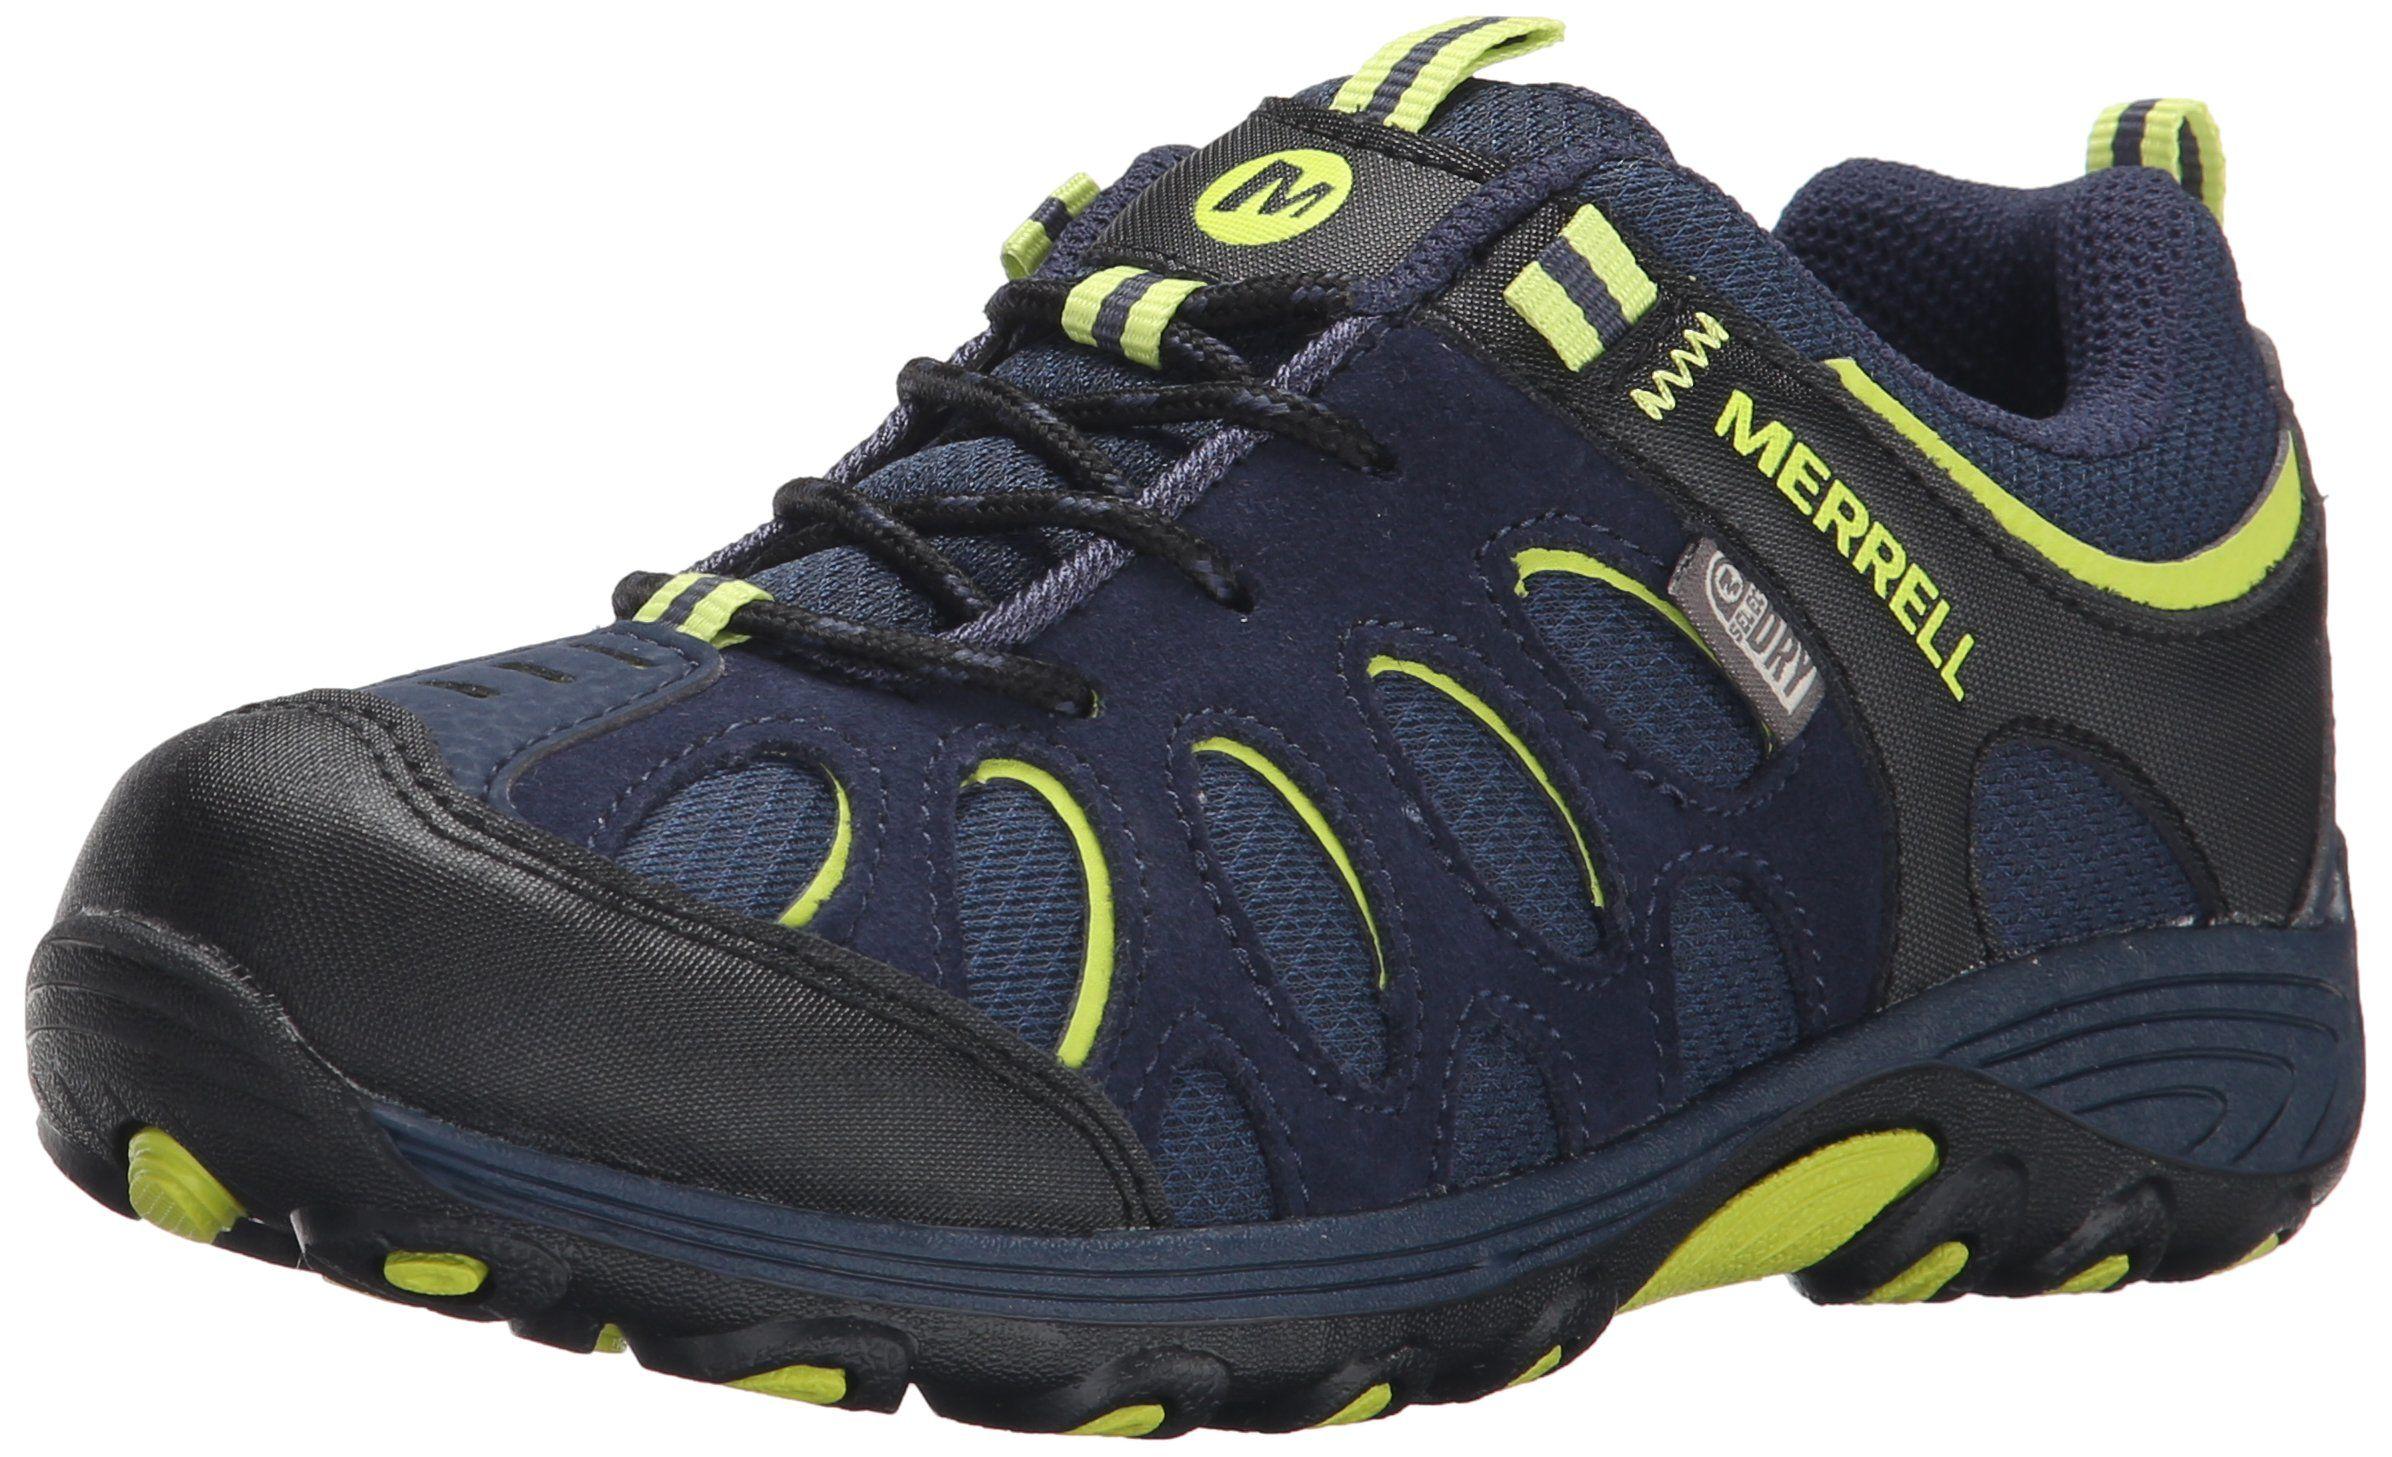 322a1bd93a Merrell Chameleon Low Lace Waterproof Hiking Shoe (Little Kid/Big ...